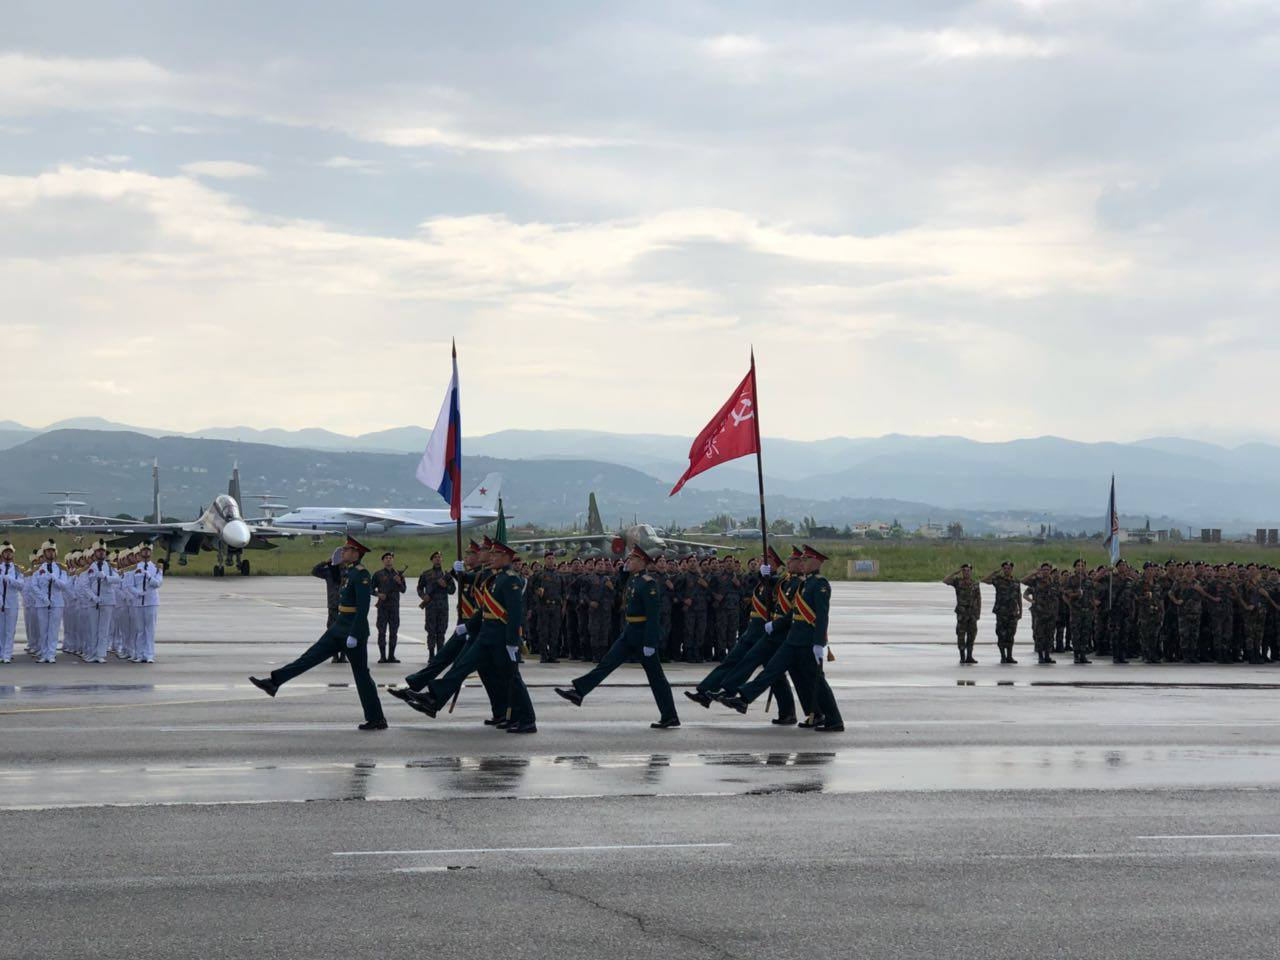 Парад Победы на авиабазе Хмеймим 9 мая 2018 года